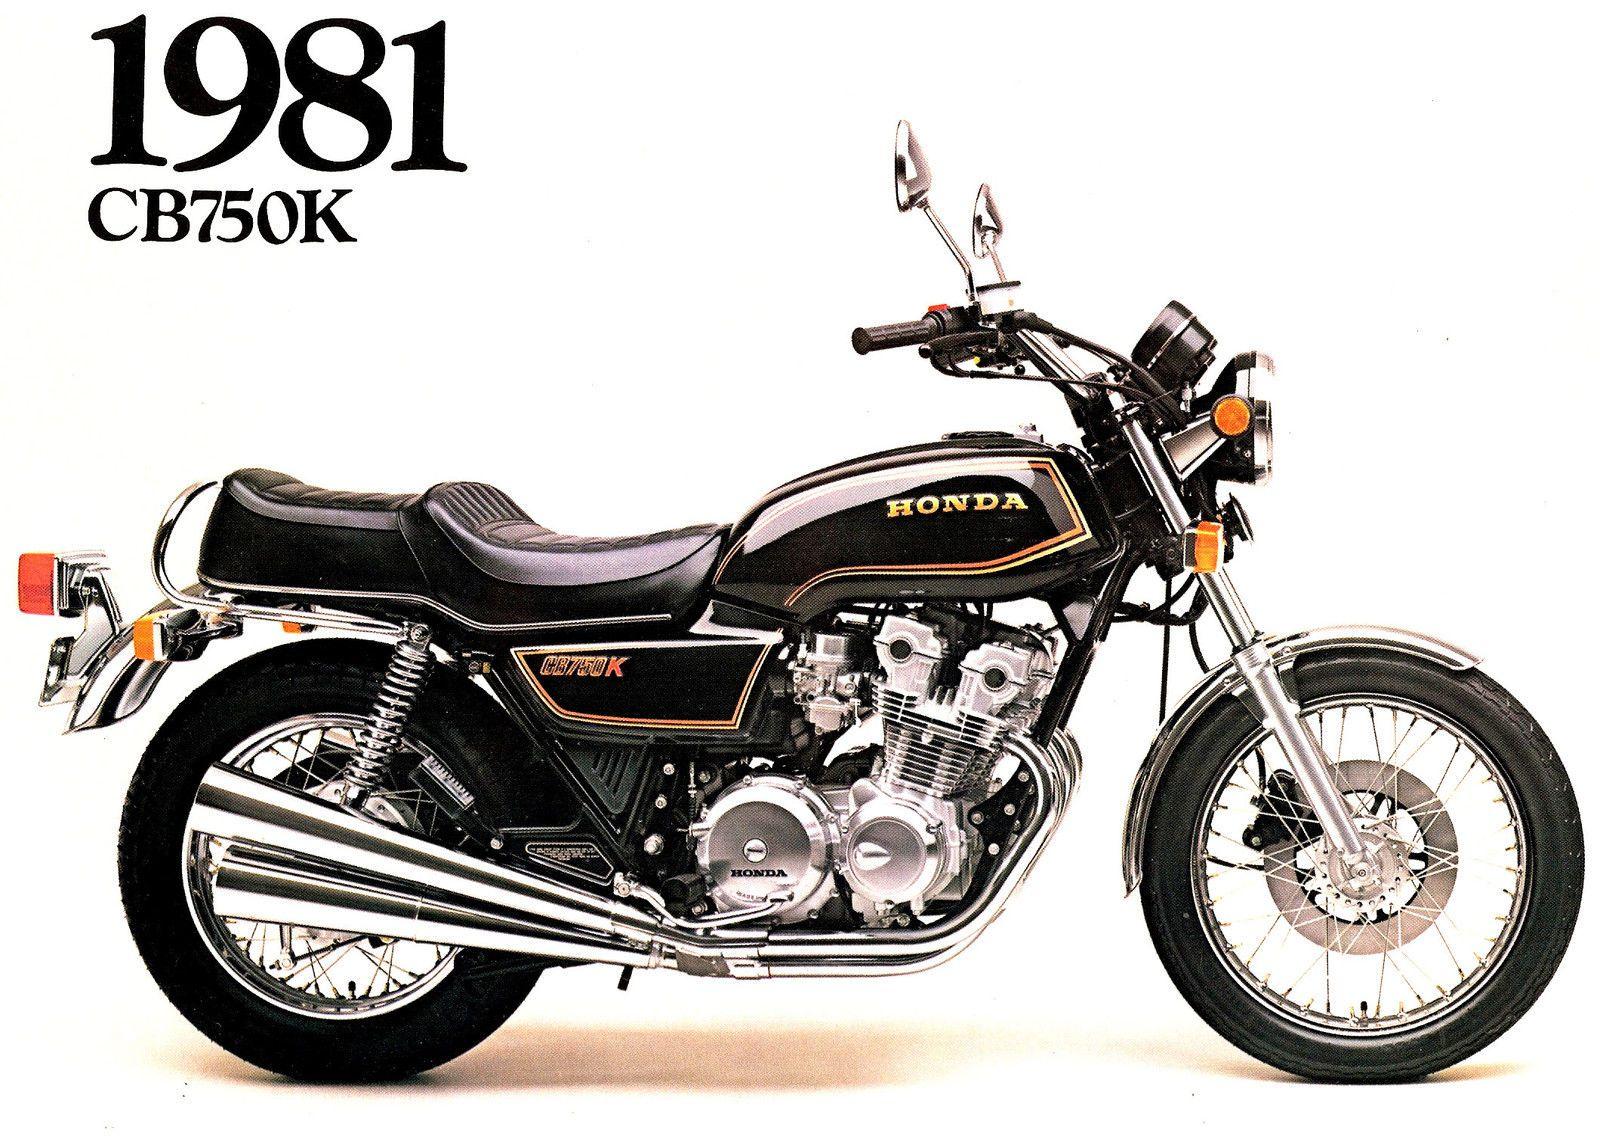 Honda Cb750k 1981 Ad Honda Cb750 Vintage Honda Motorcycles Motorcycle [ 1143 x 1600 Pixel ]